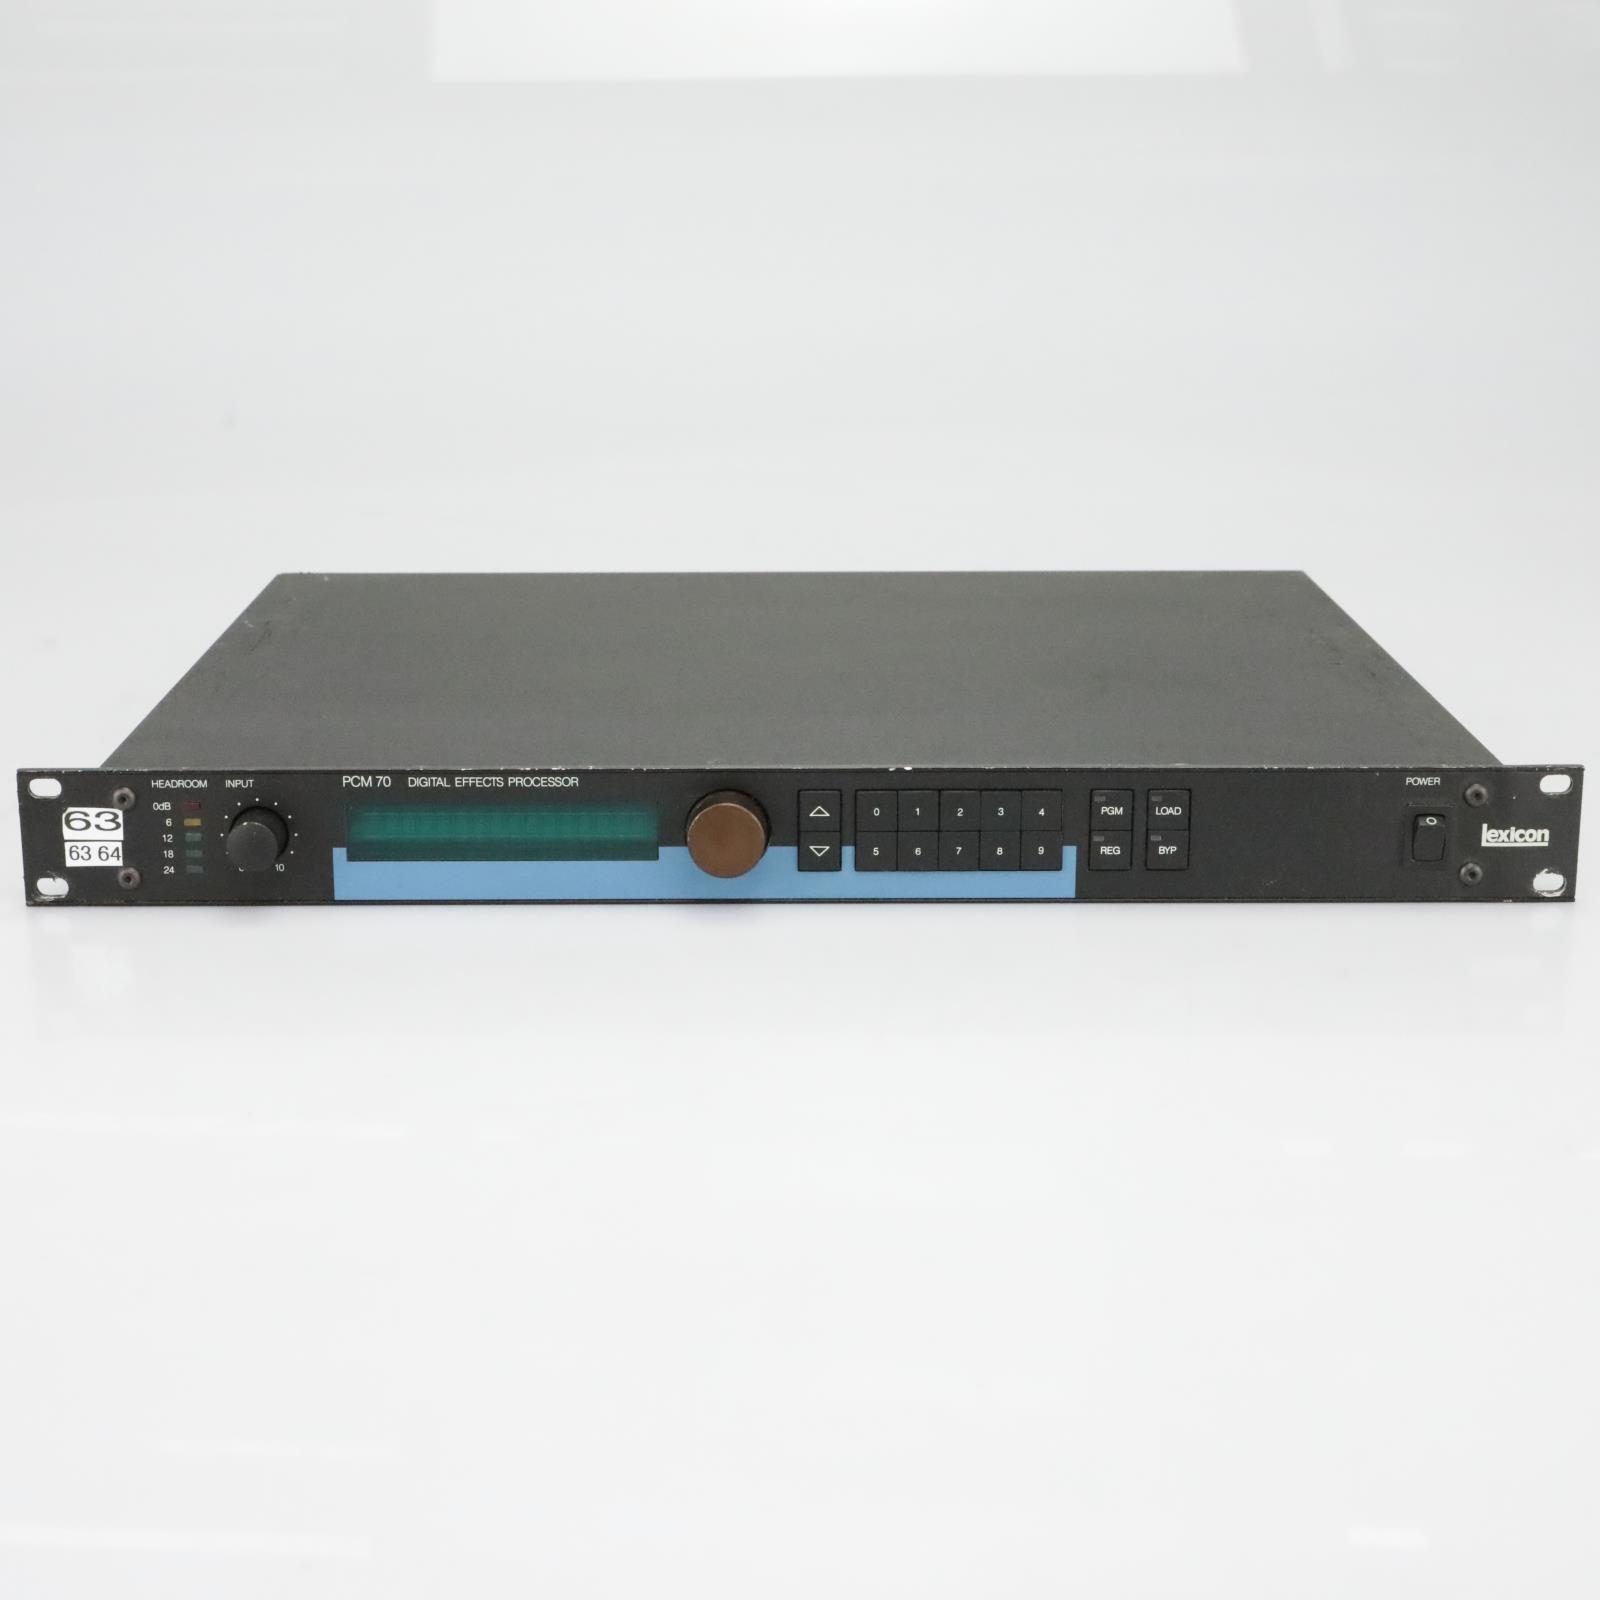 Lexicon PCM 70 Digital Effects Processor #40131